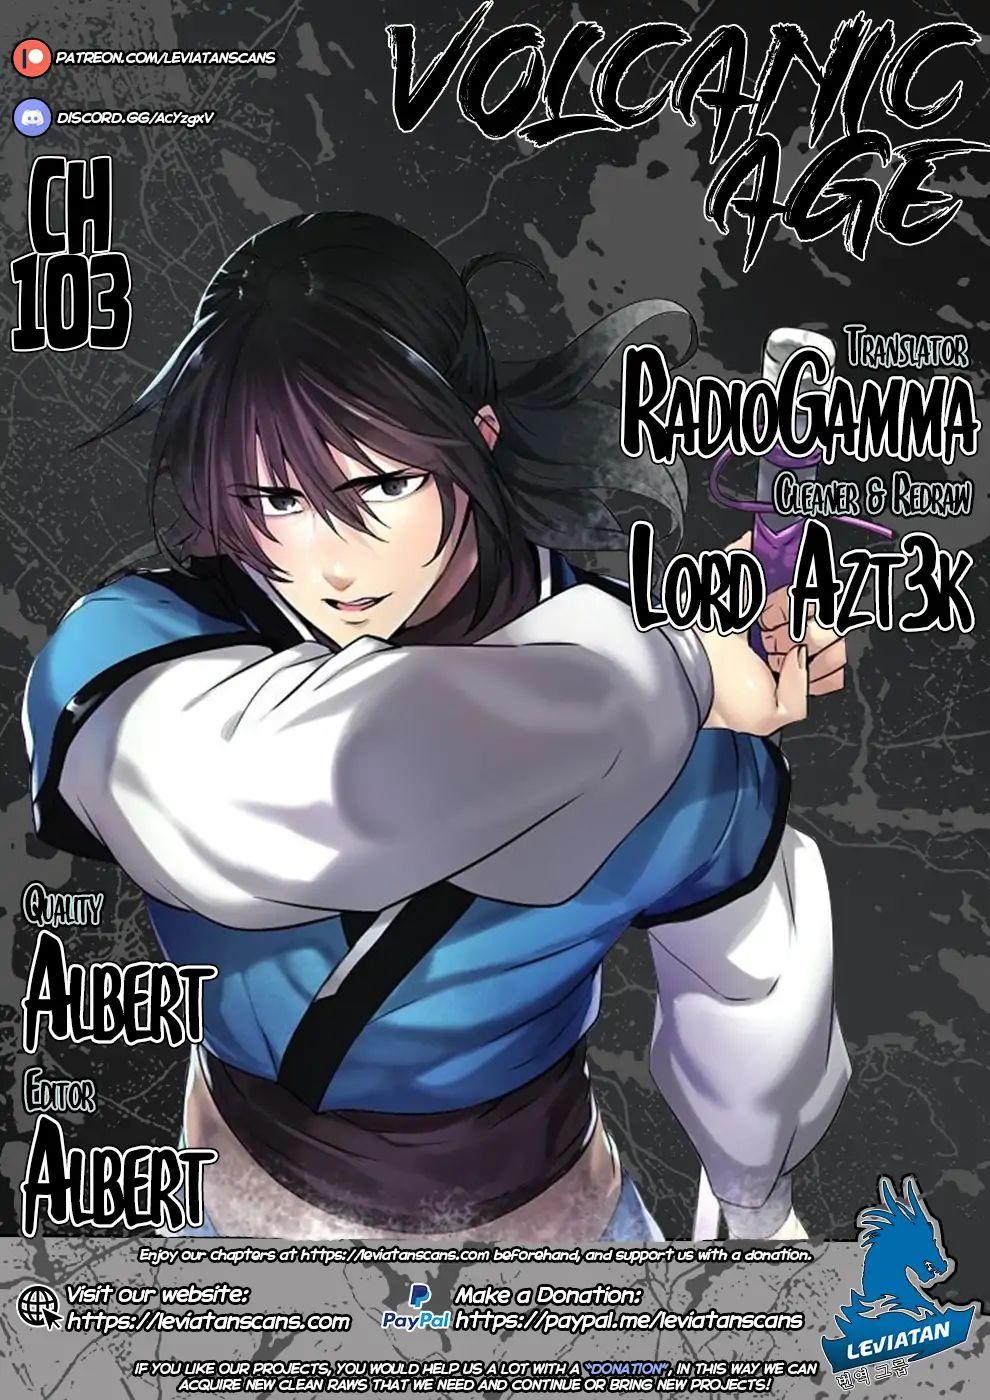 https://manga.mangadogs.com/comics/pic2/2/20226/867011/47cd3e9ed7b13c4c45a863f4f0bfecdc.jpg Page 1